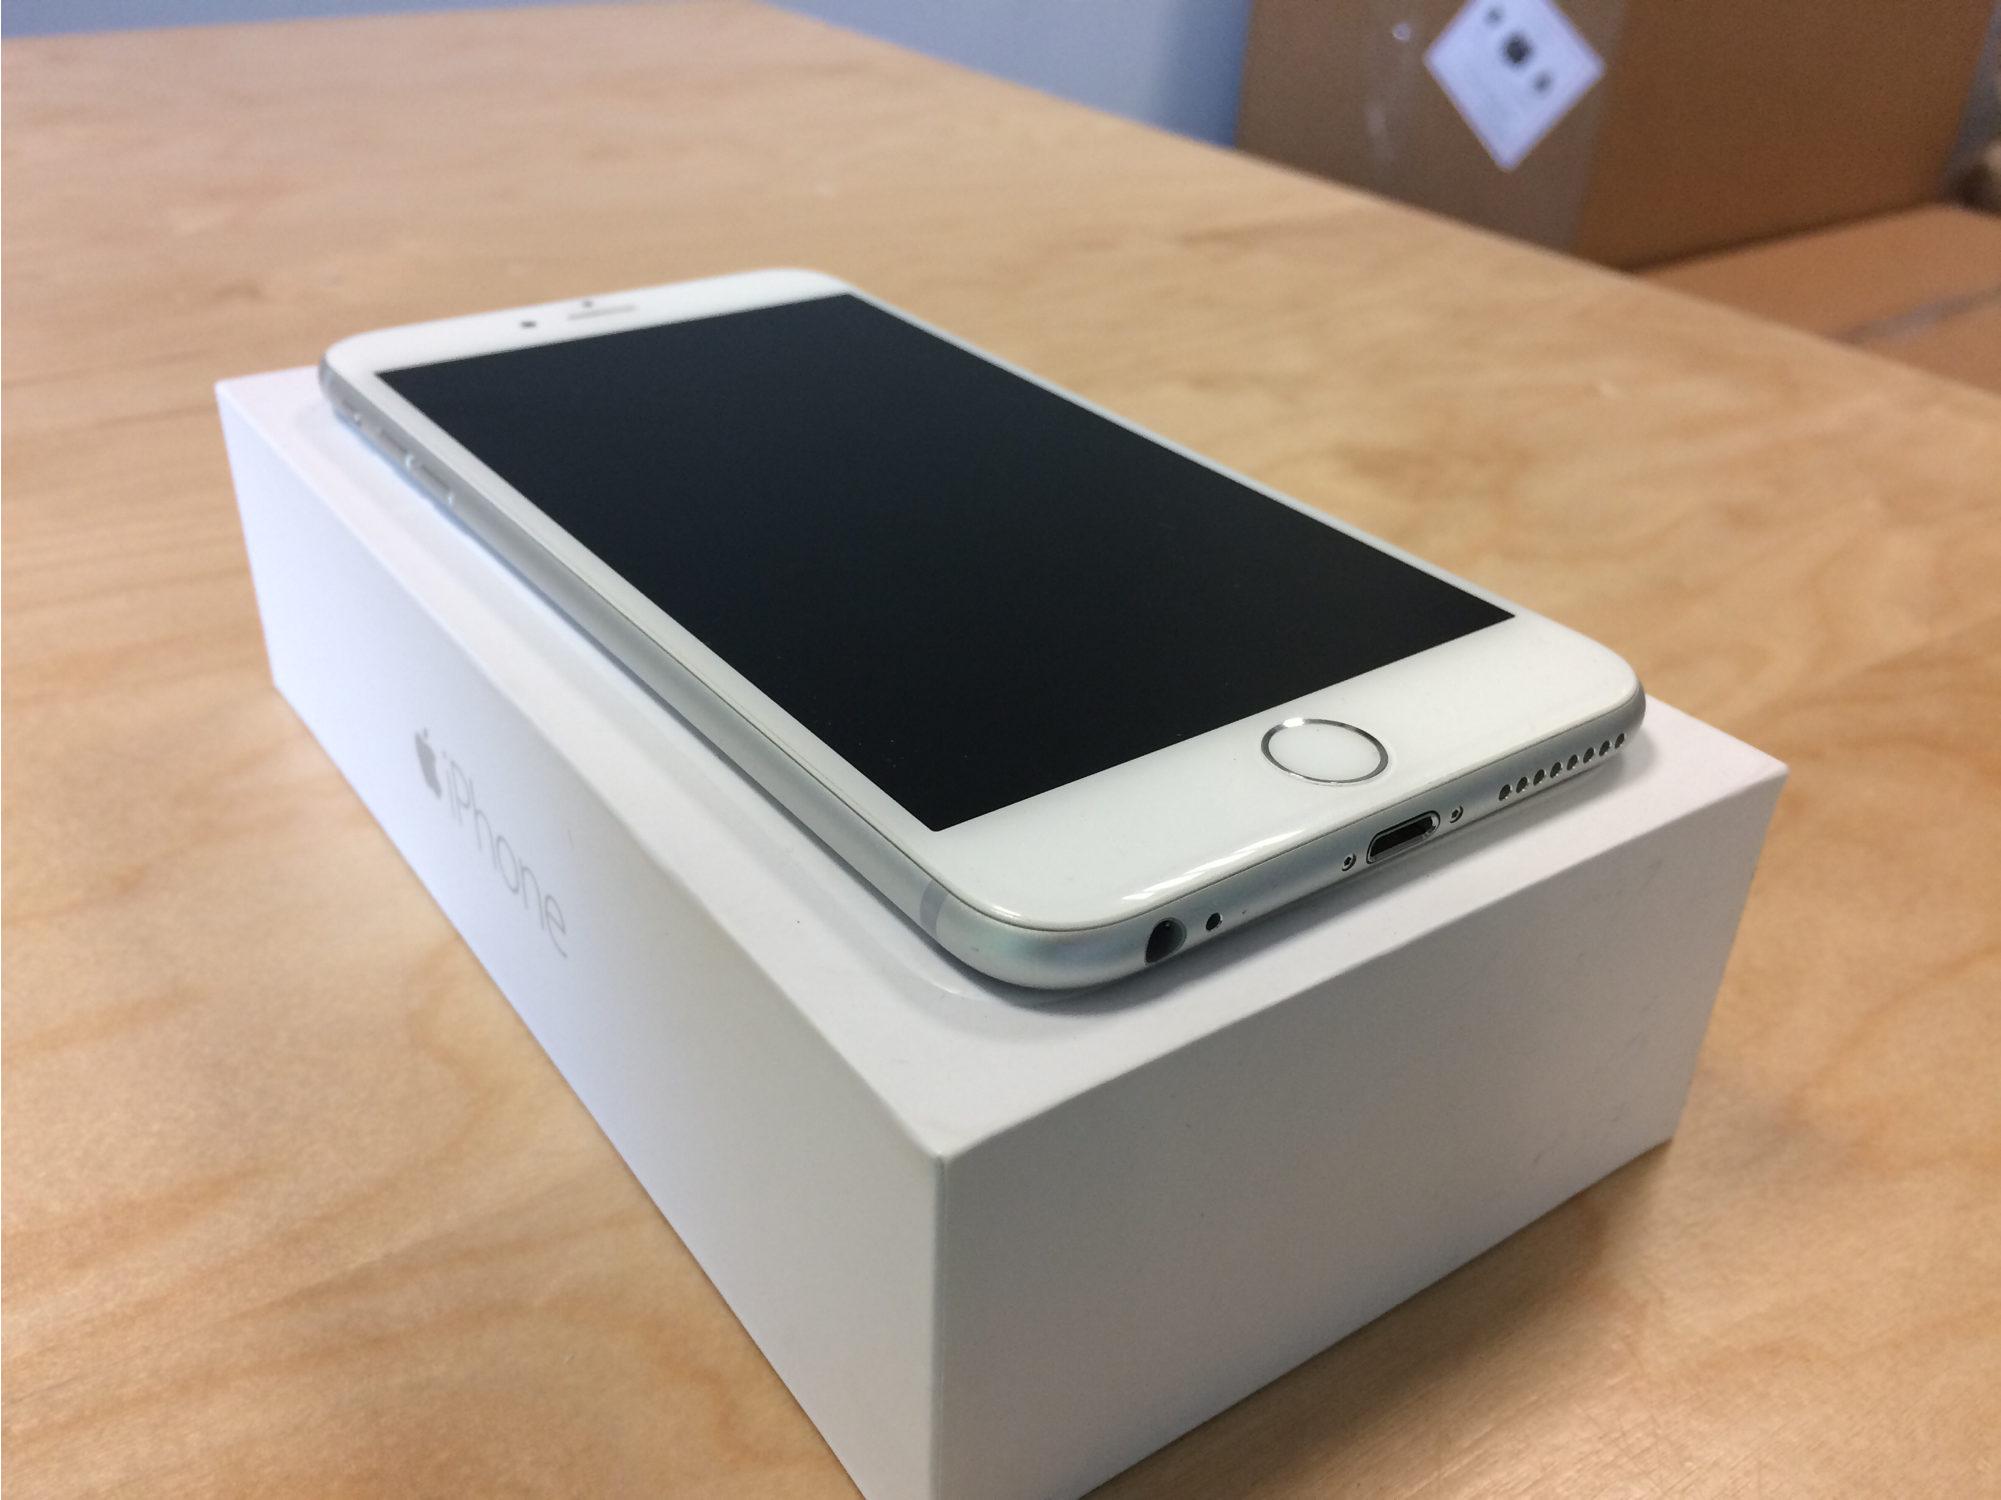 iPhone 6 Plus 64GB, 64GB, Silver, Afbeelding 4